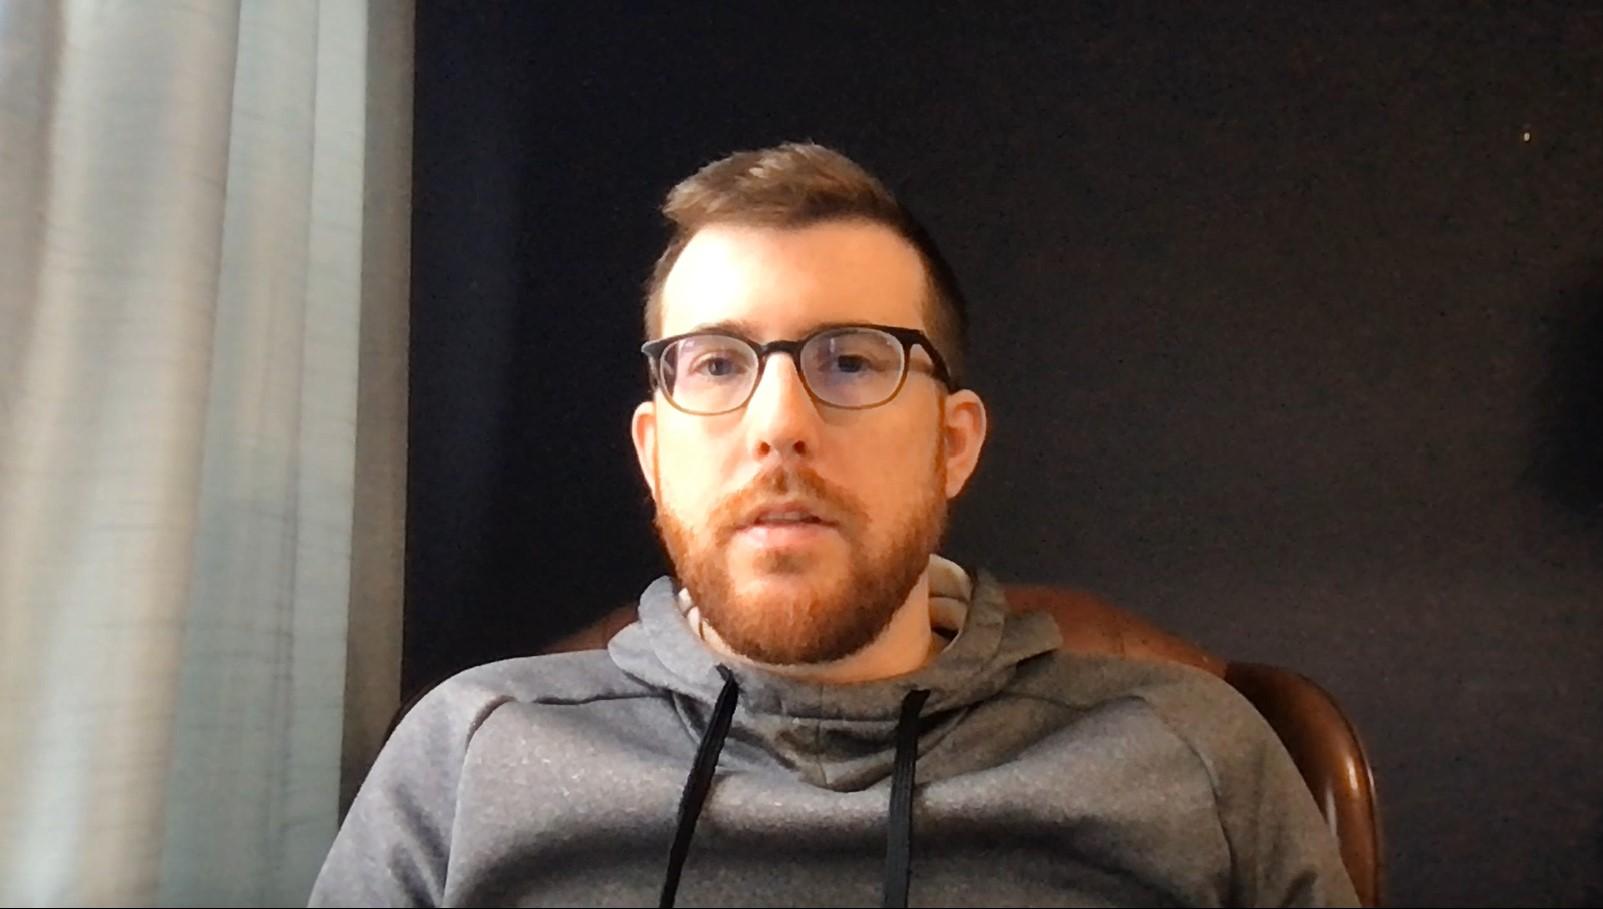 Yedid Herskovitz describes work done with Luminous on Rapidream.